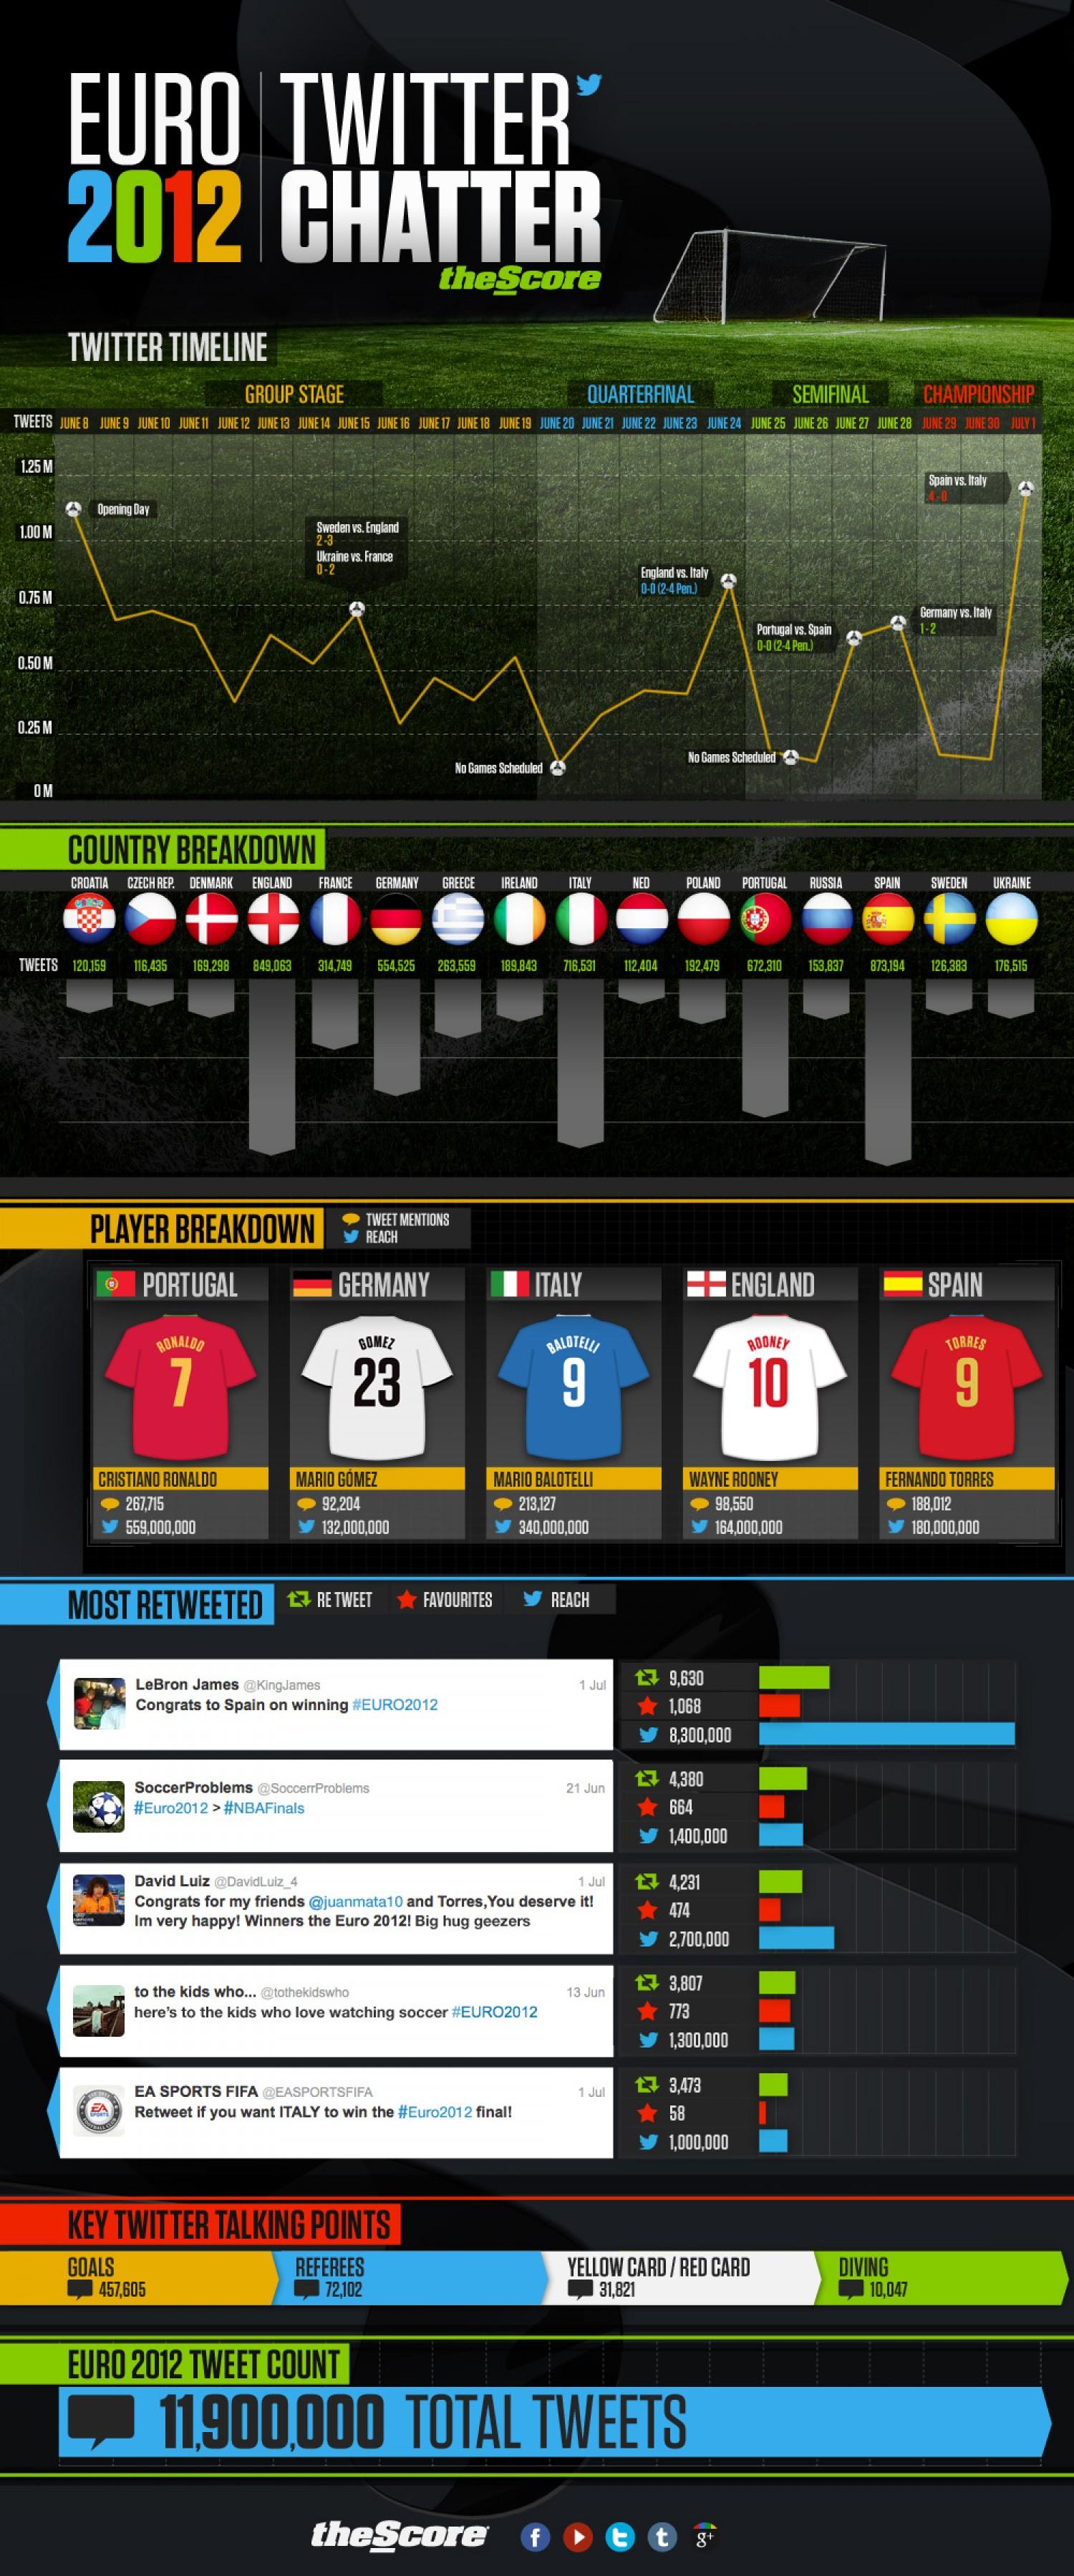 18. Euro 2012 Twitter Chatter